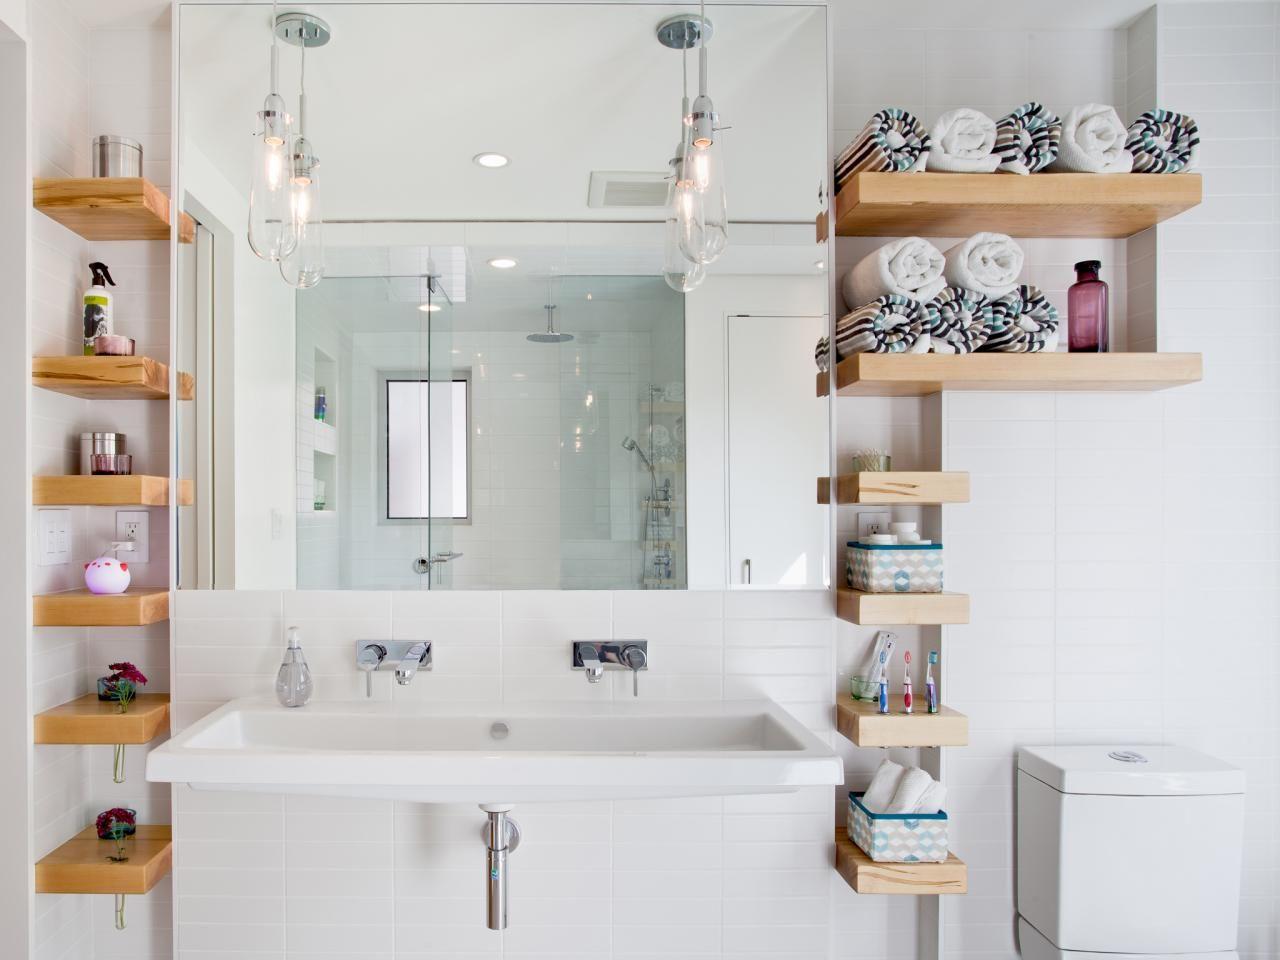 Creative Bathroom Storage Ideas | BATHROOMS FOR ALONE TIME ...